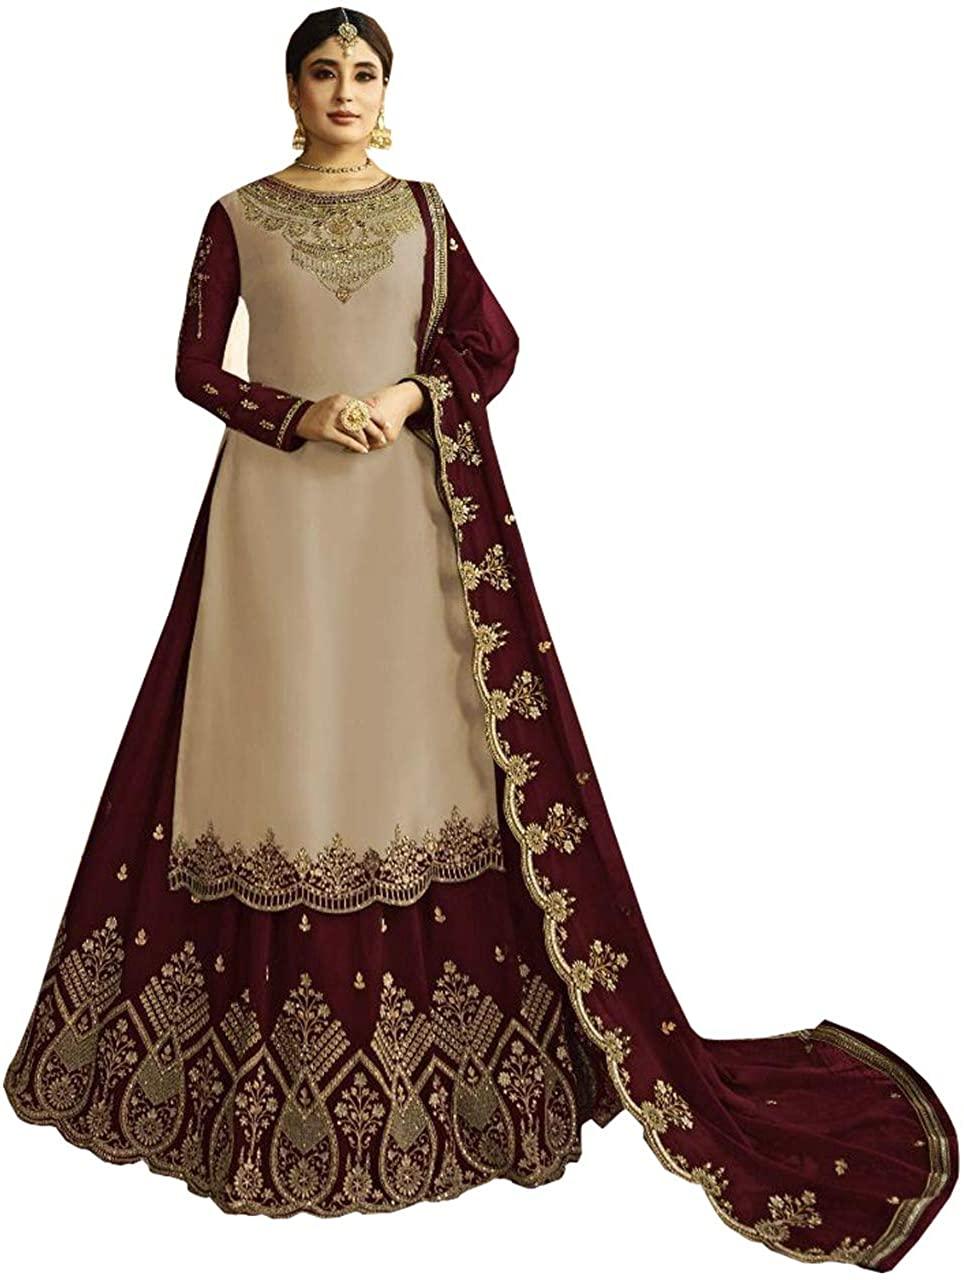 Ghagra/Sharara Styel Suit for Women New Indian/Pakistani Wedding/Party Special Heavy Bridal Lehenga